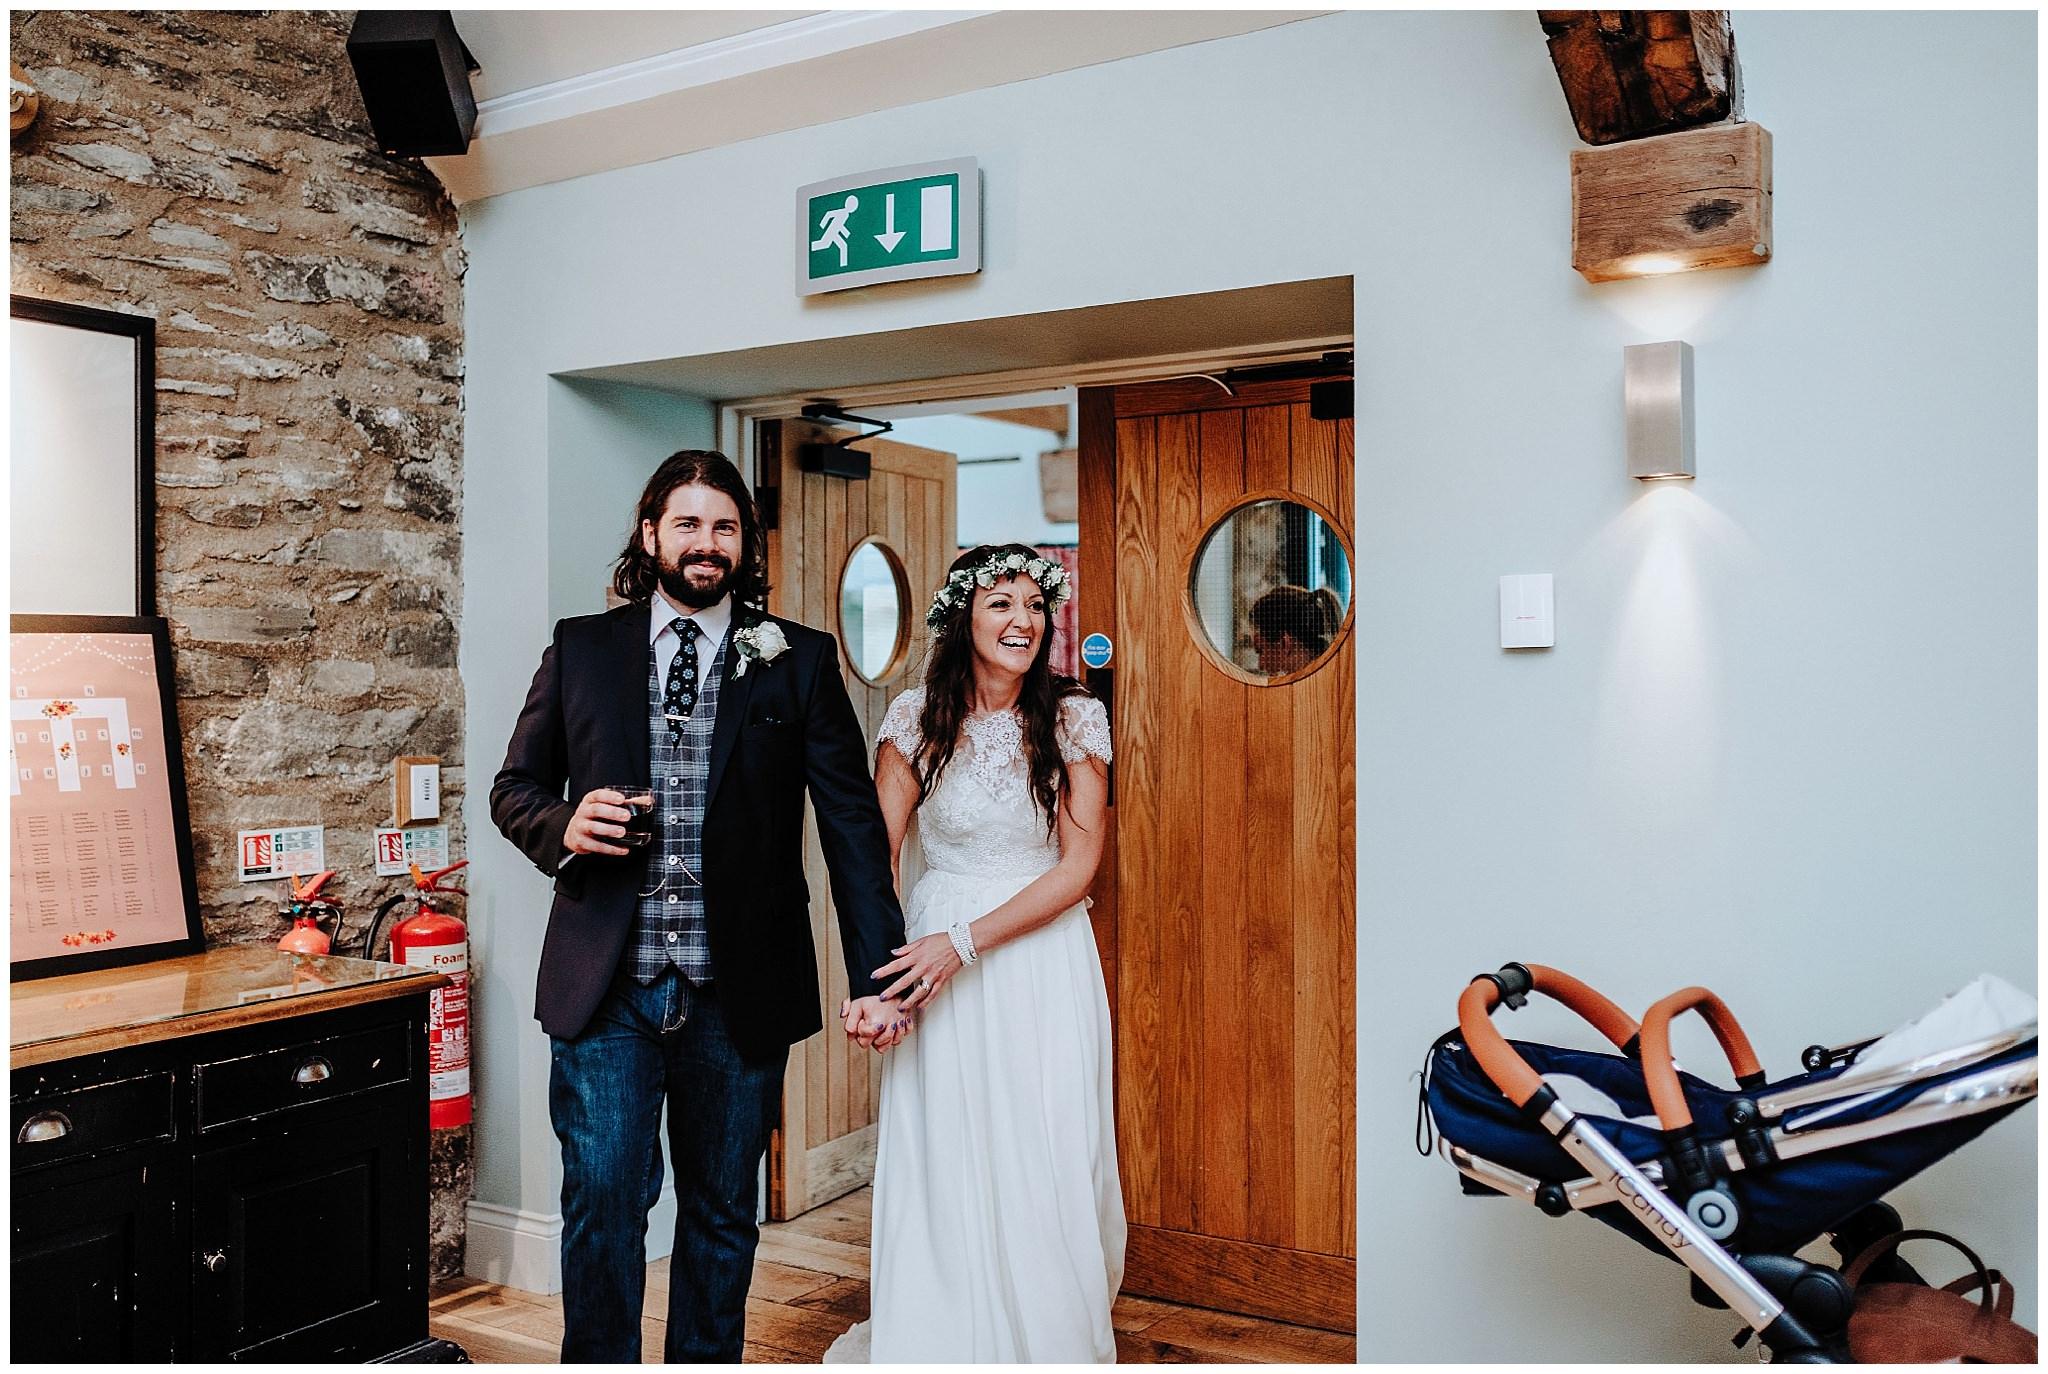 Bride and Groom walking in to wedding breakfast at Bodnant Welsh Food Centre